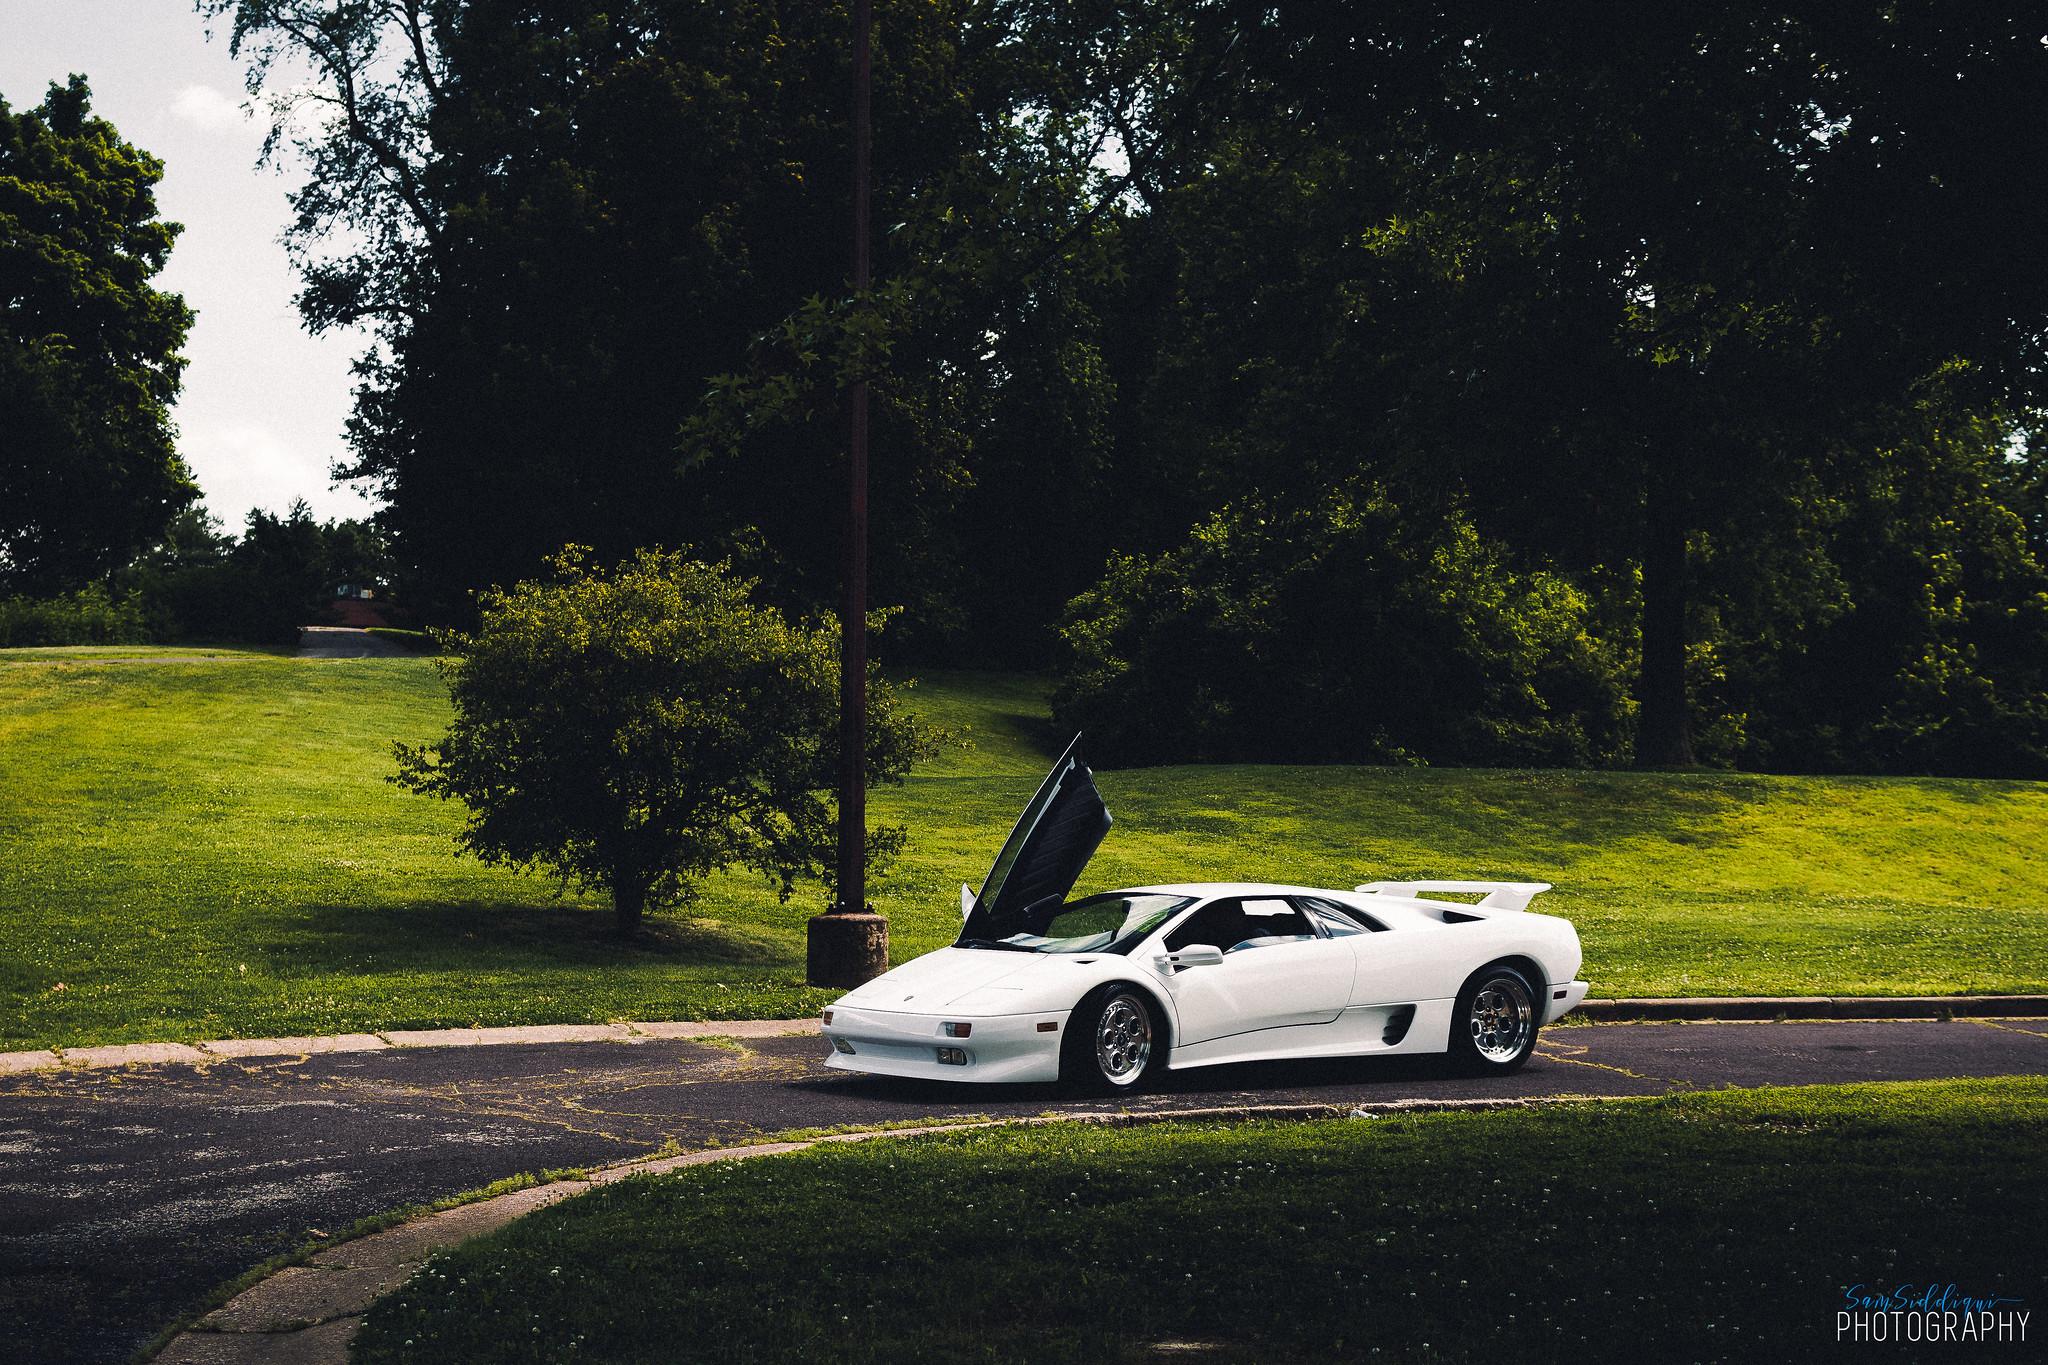 1991 White Lamborghini Diablo on road